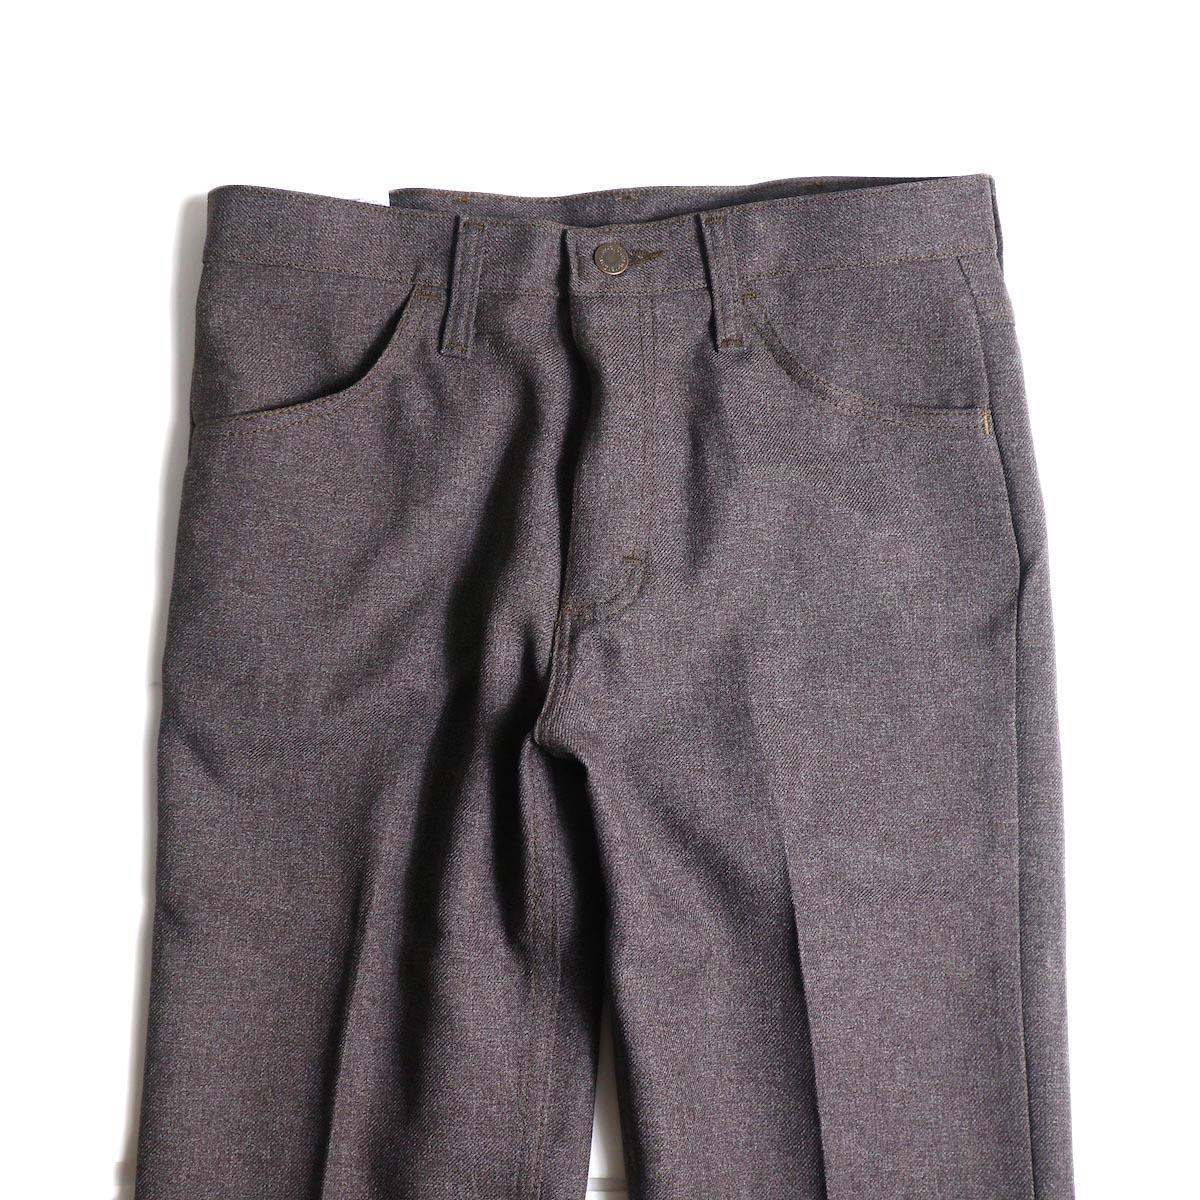 Wrangler / WRANCHER DRESS JEANS (H.Darkchoco)ウエスト